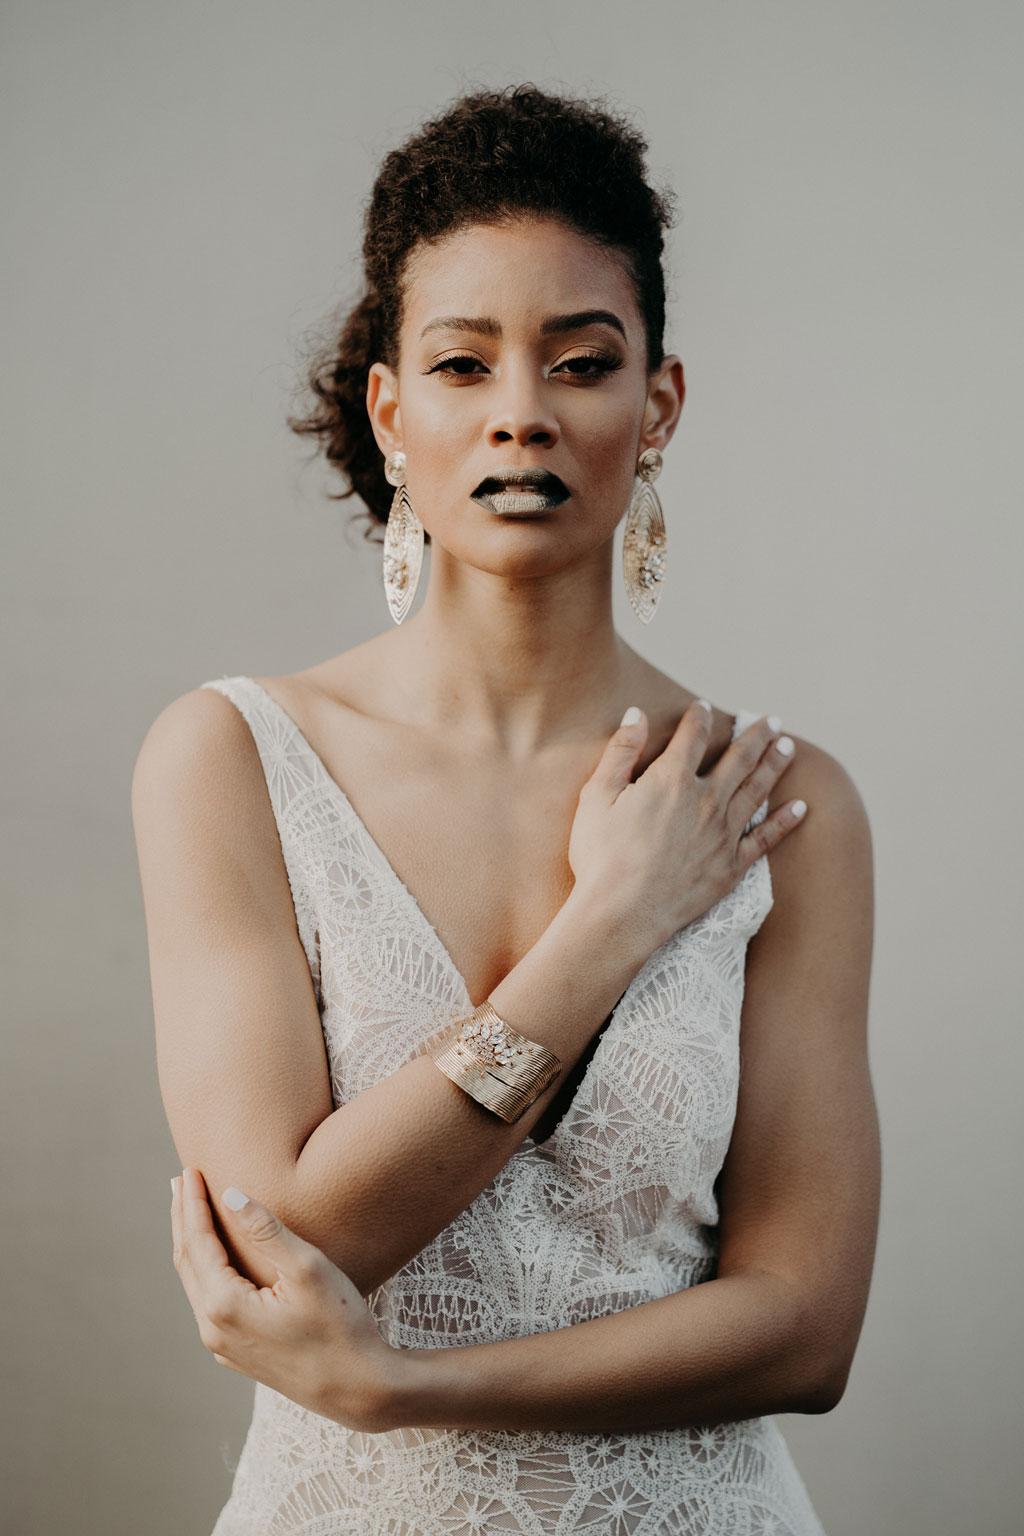 coiffure maquillage rock Widnie Alexis Manon Gontero